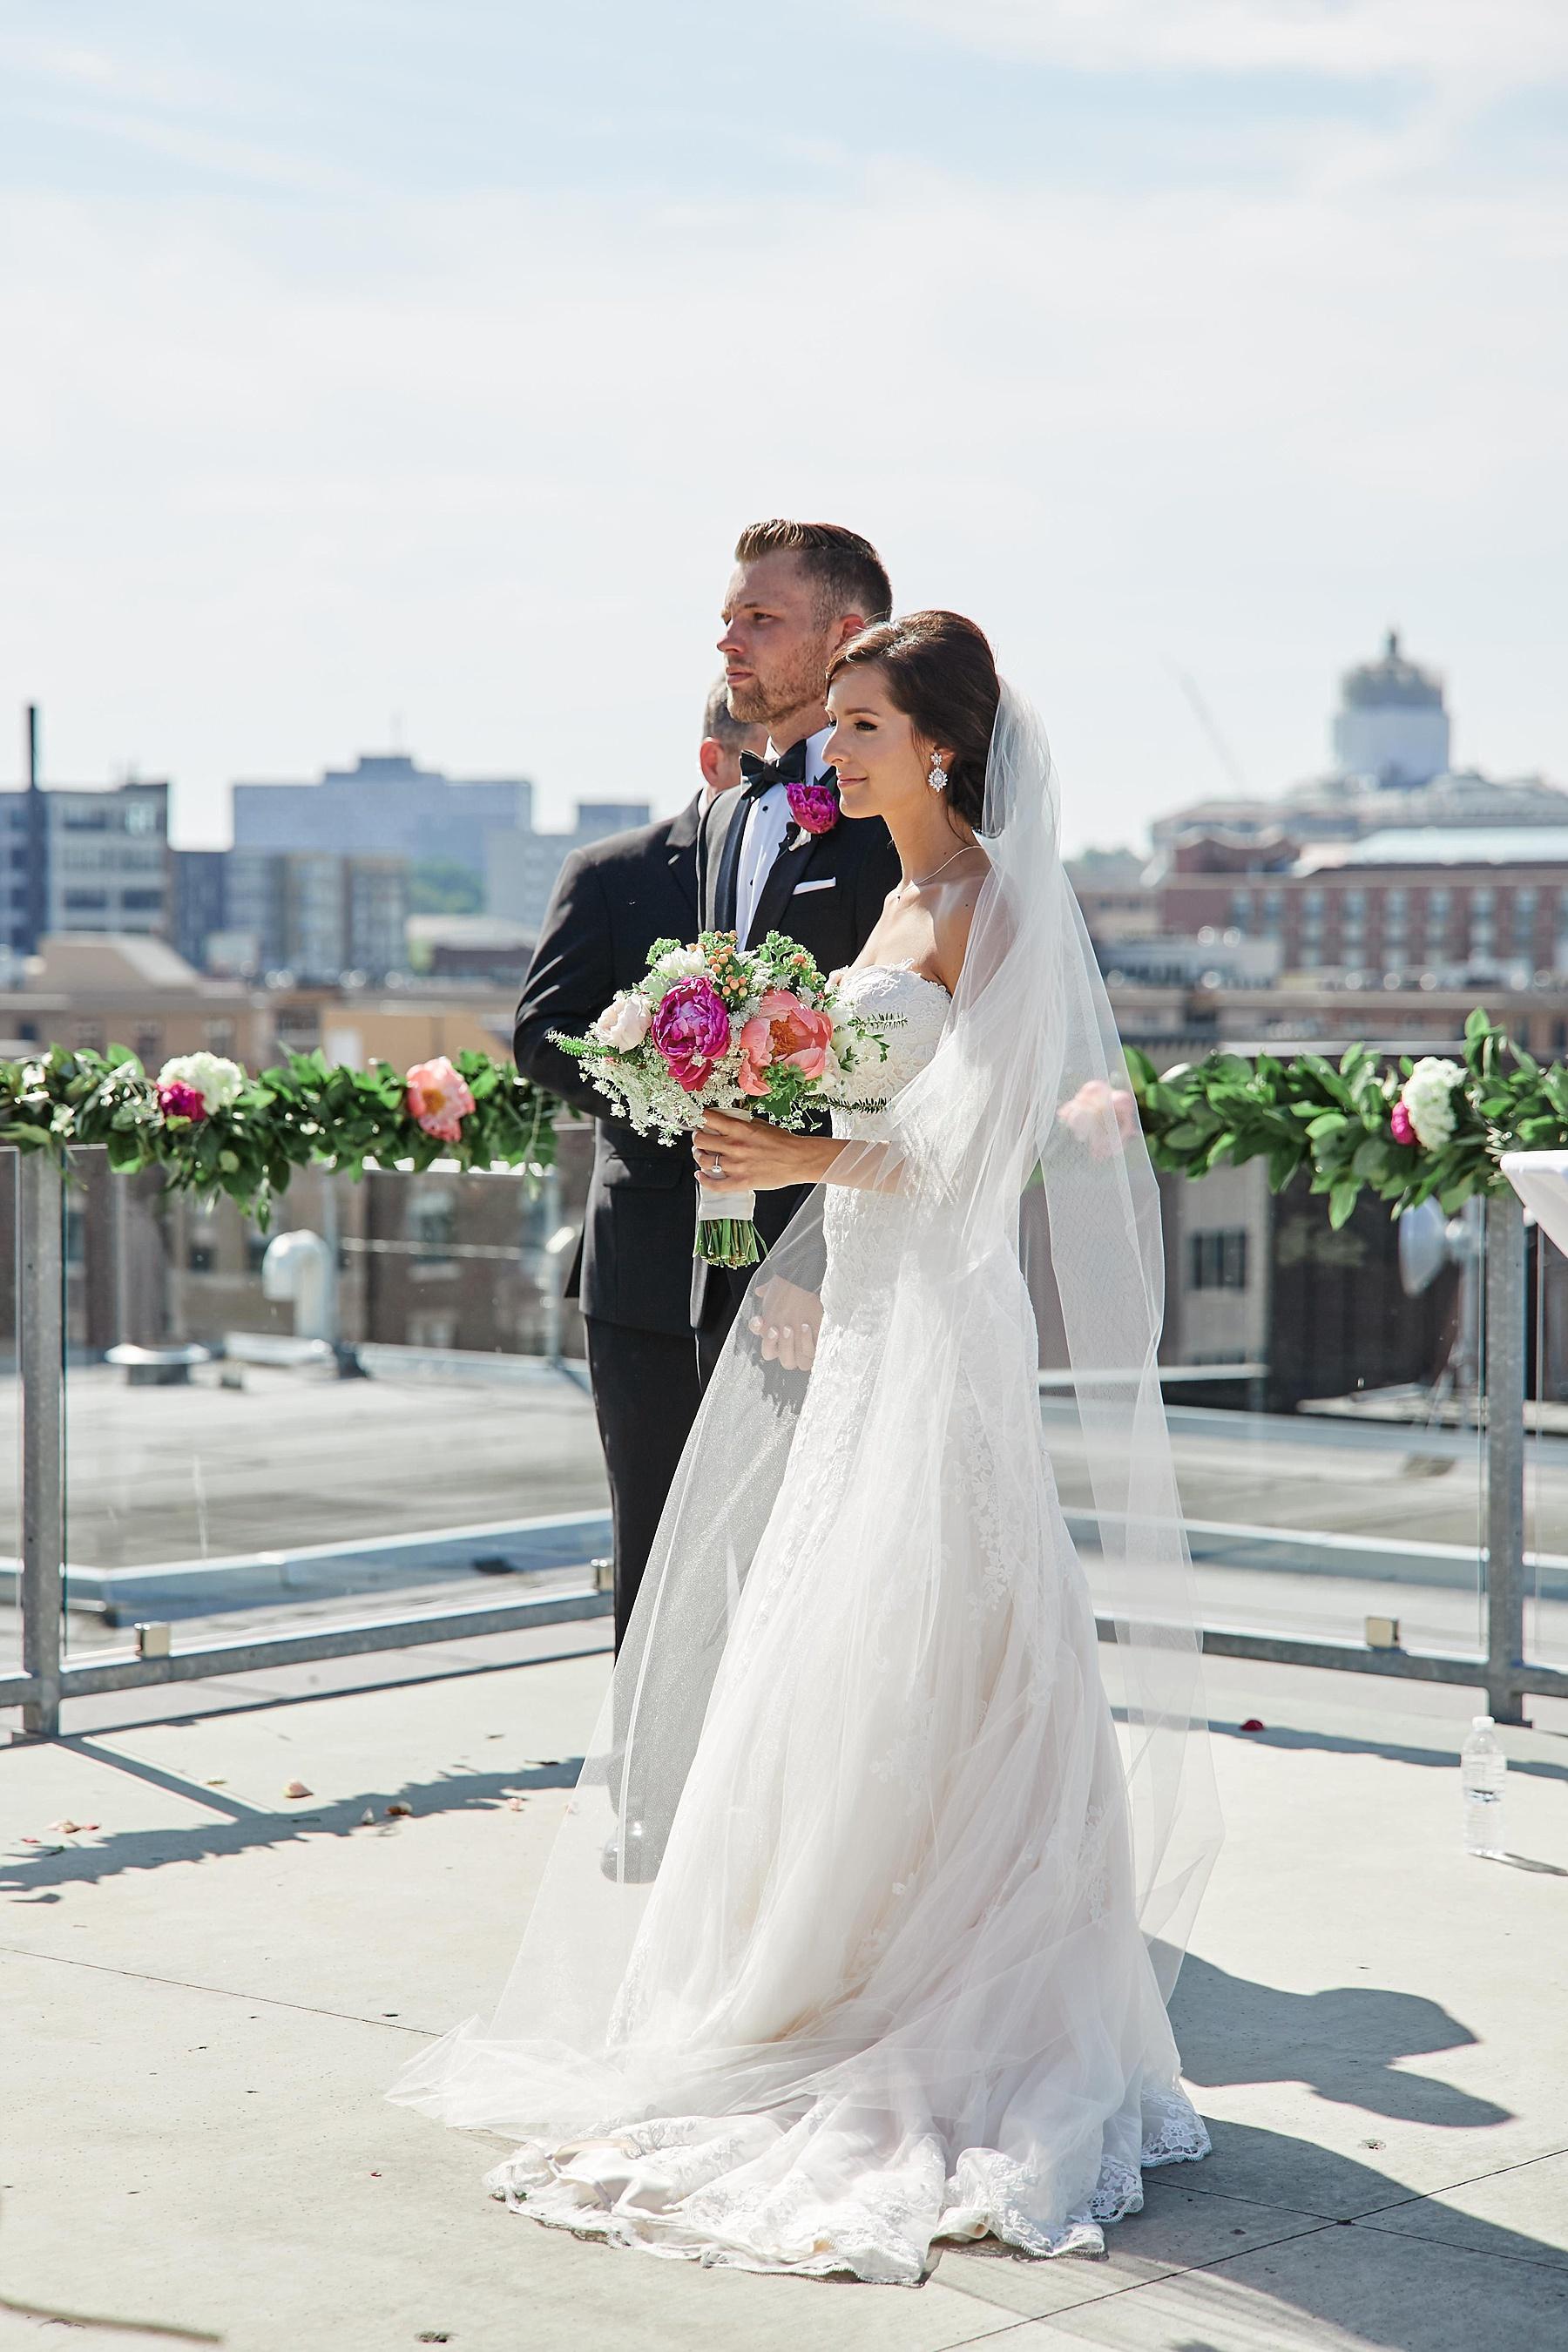 ABULAE-Wedding-Saint-paul-MN-Josh-Sofia-Wedding-Mears-Park_0761.jpg